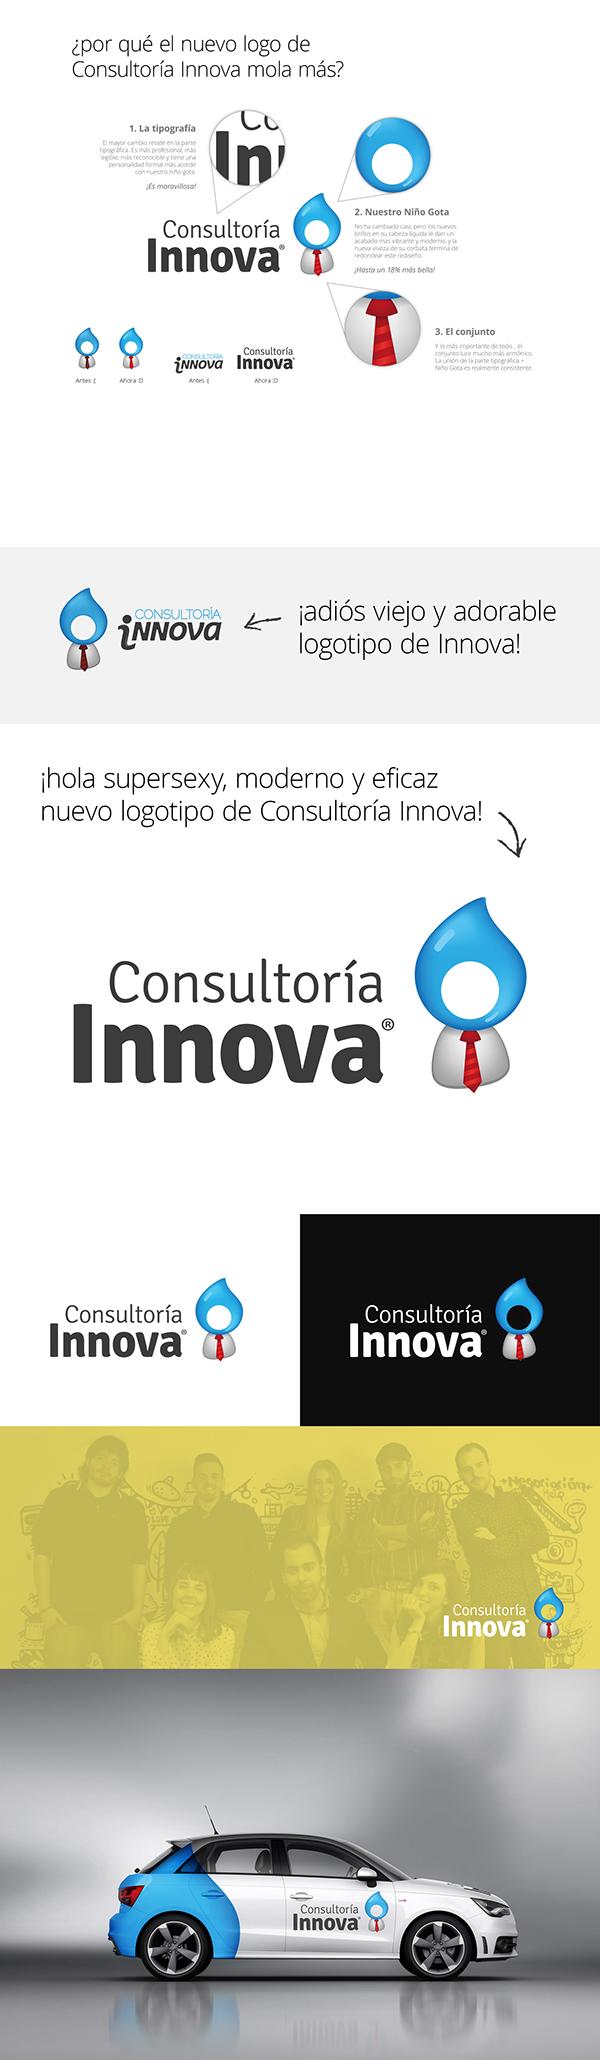 consultoria innova dumaker albacete Diseño web ilustracion motion niño gota Rediseño marca